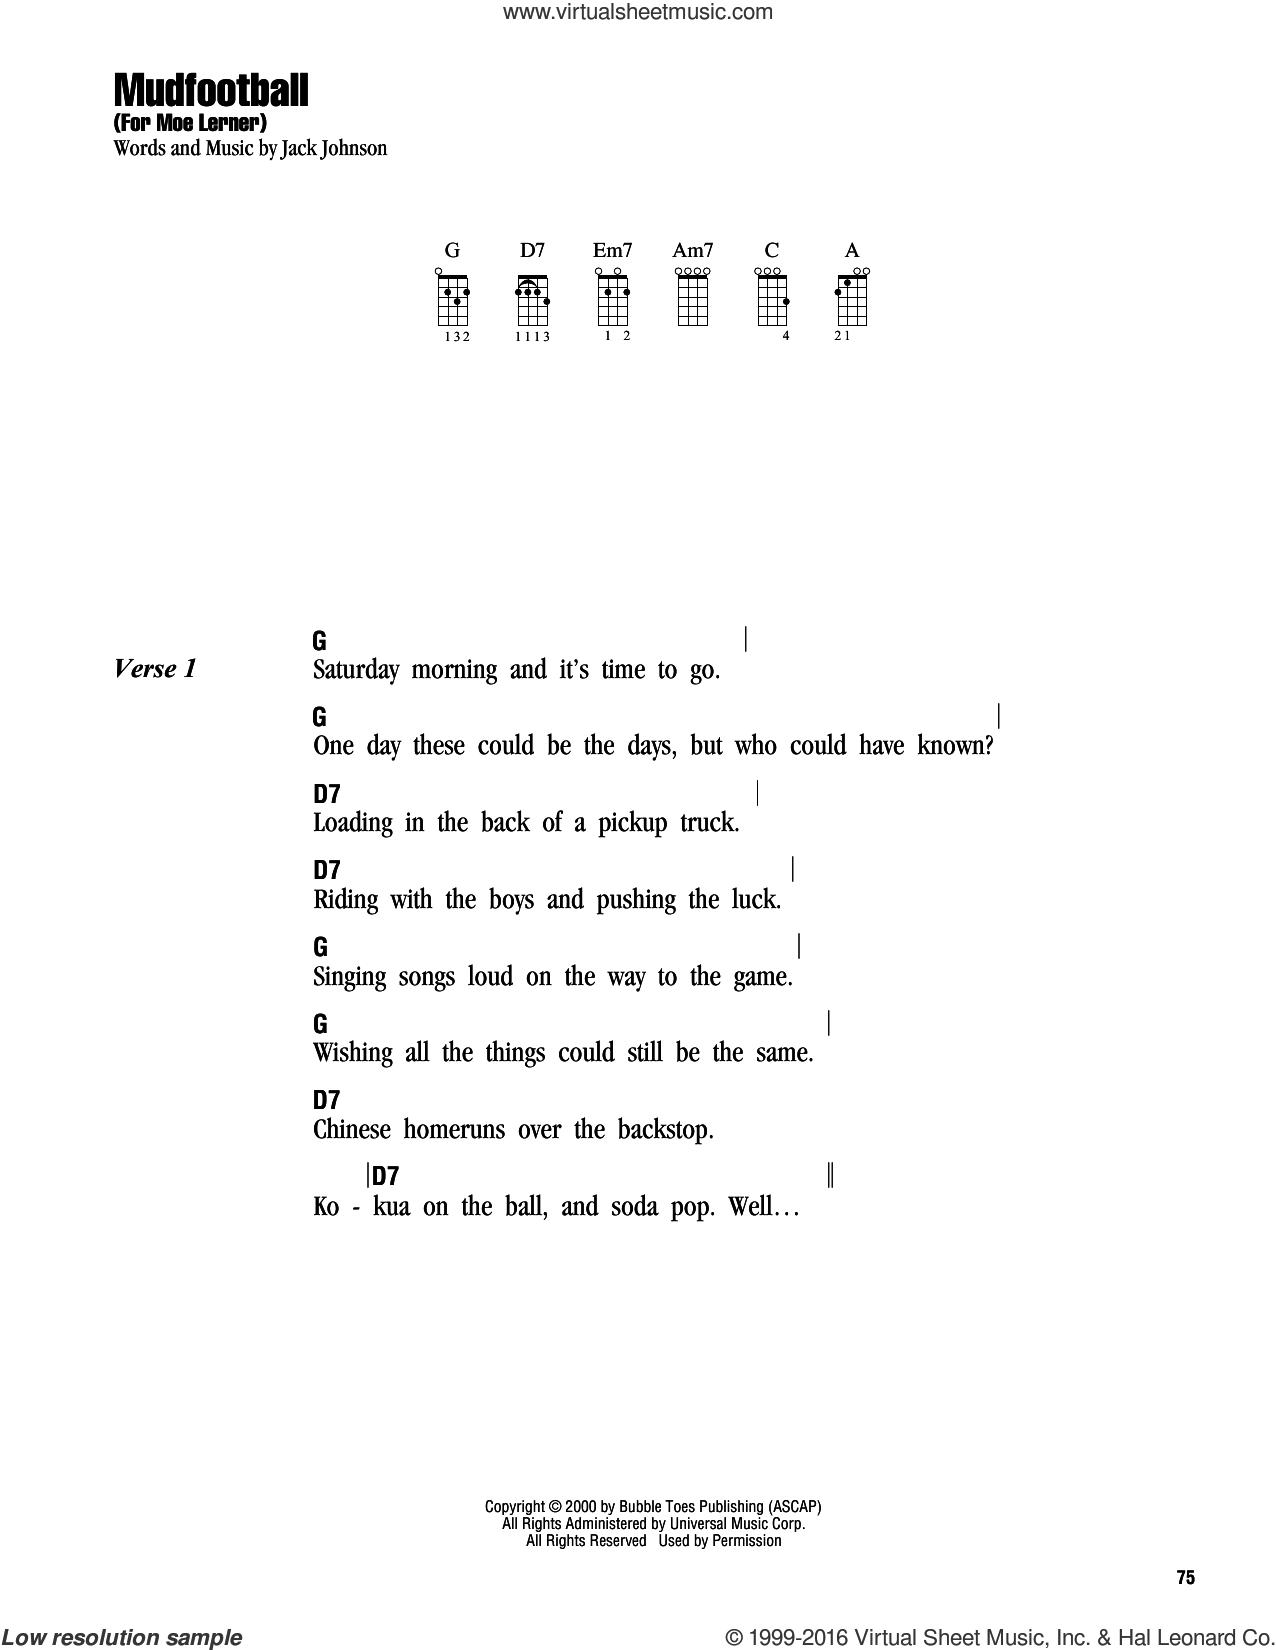 Mudfootball (For Moe Lerner) sheet music for ukulele (chords) by Jack Johnson, intermediate skill level